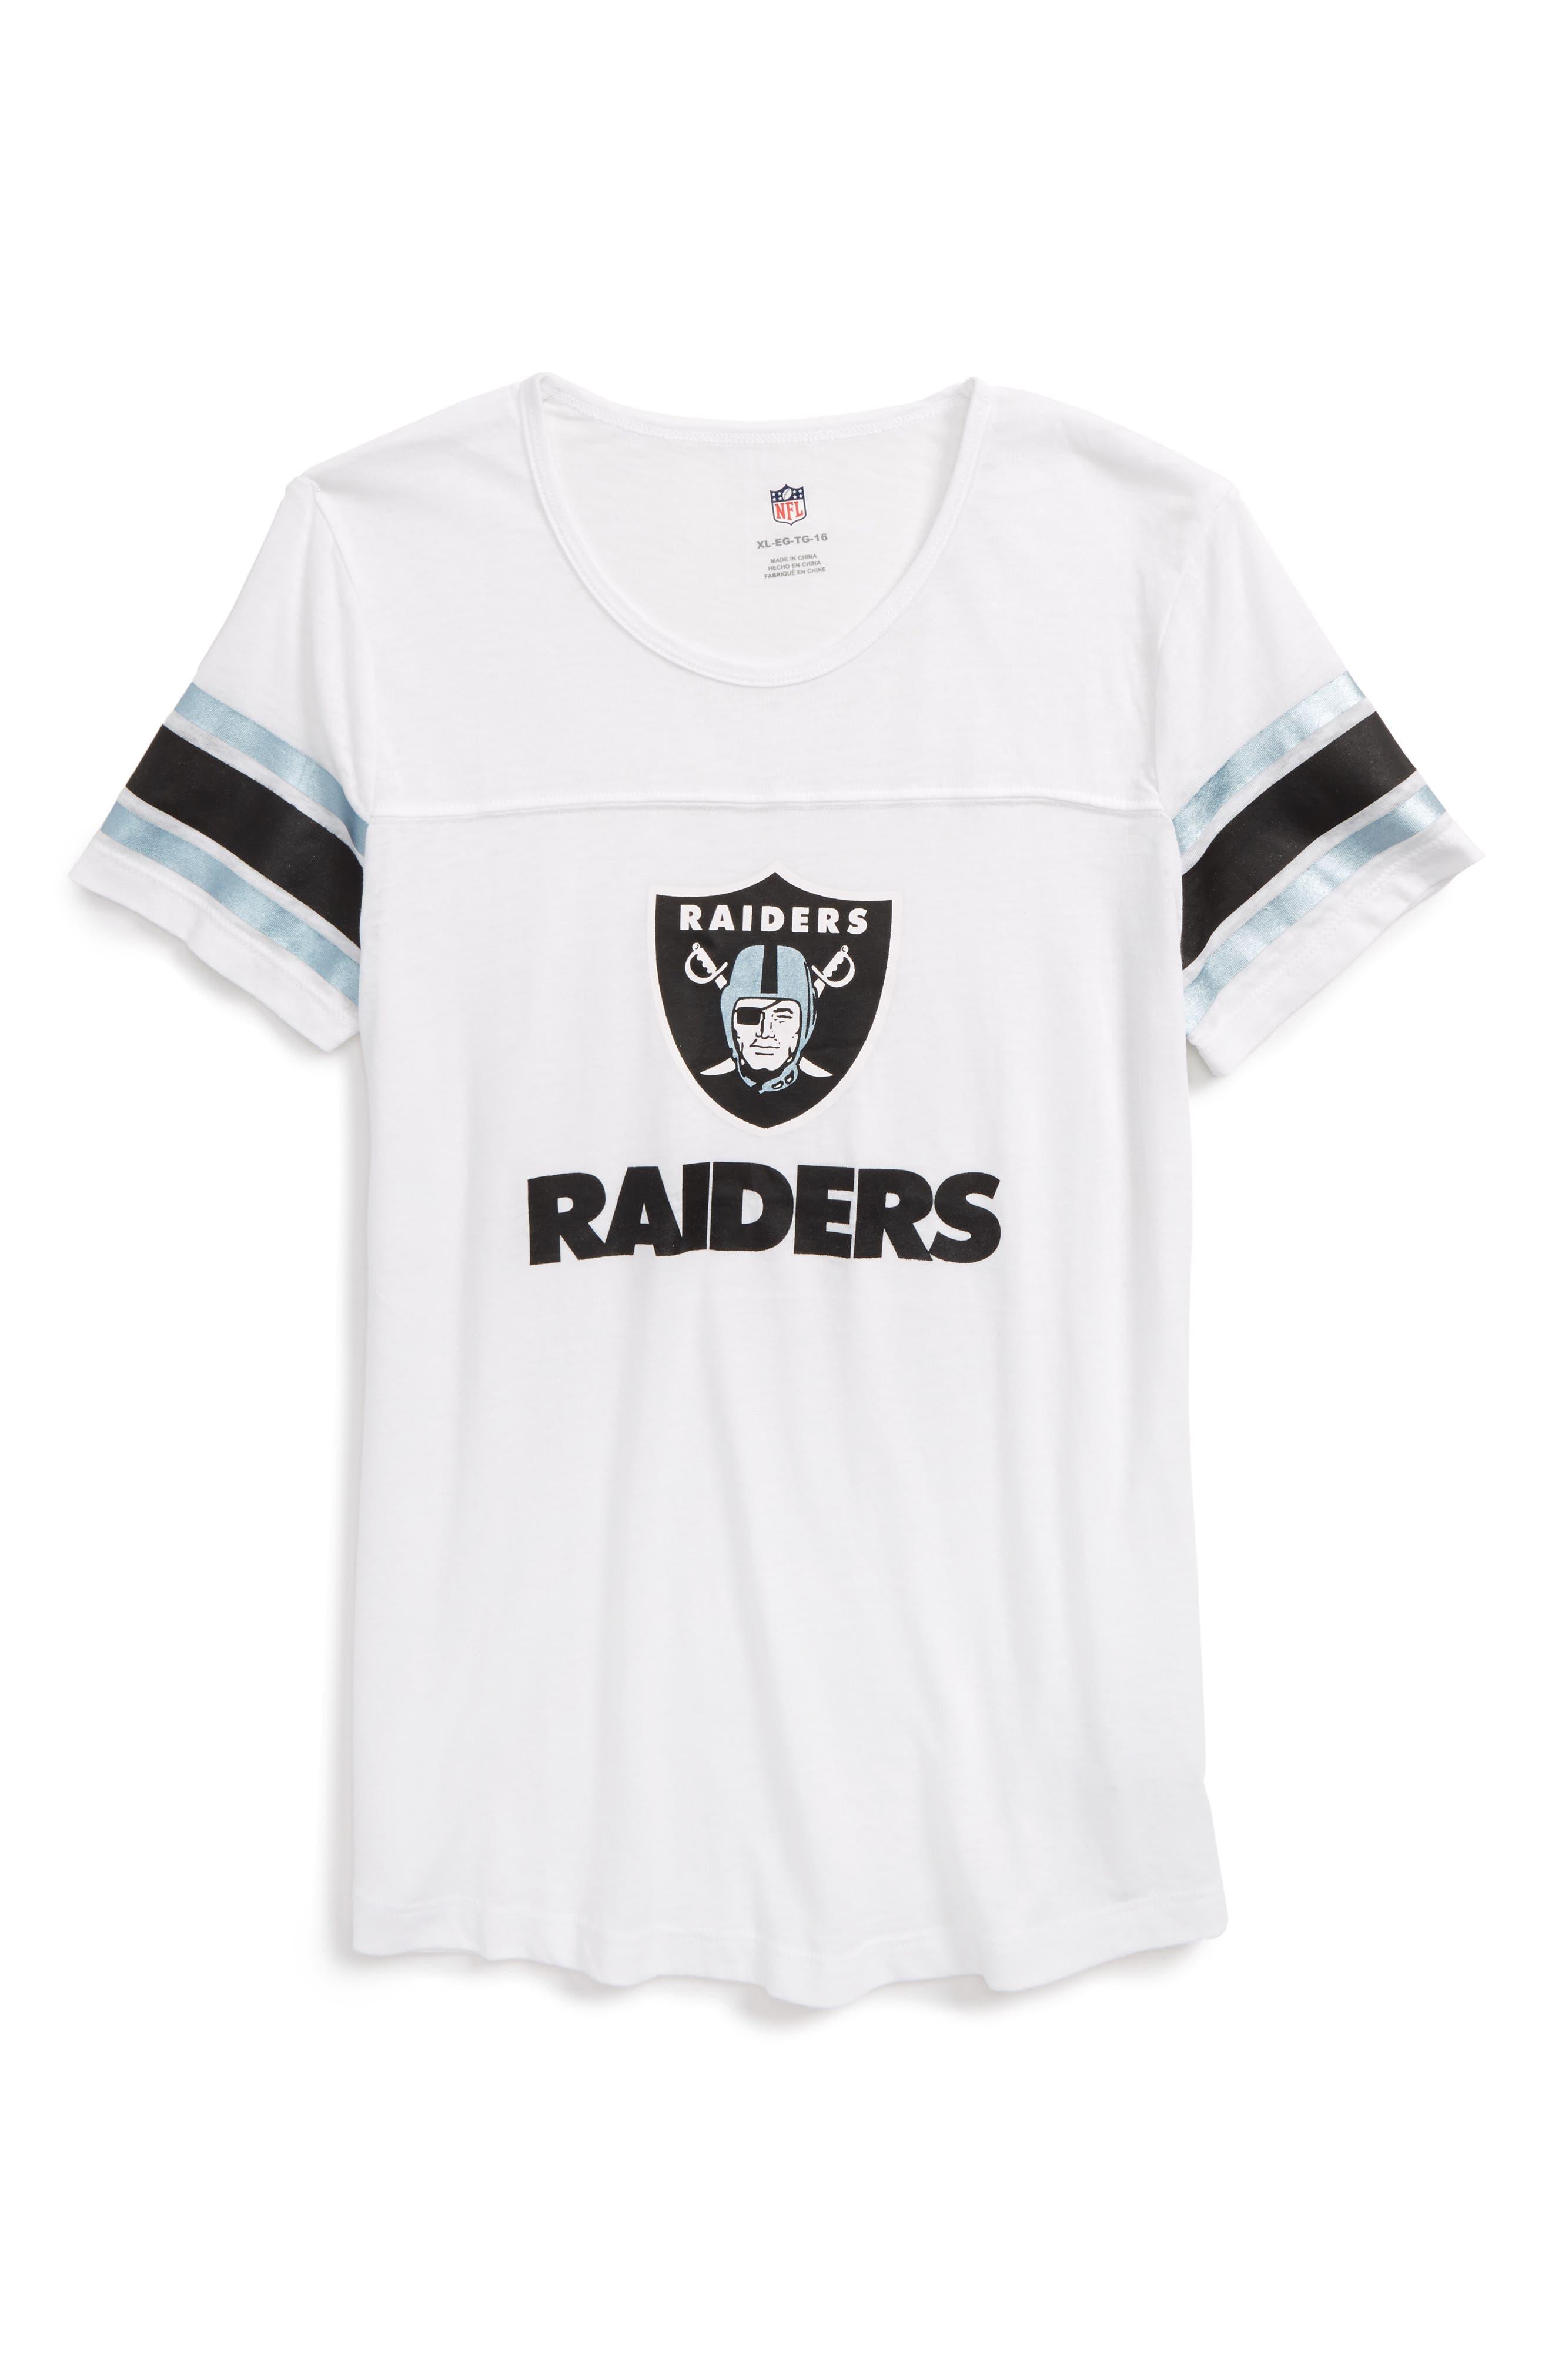 Alternate Image 1 Selected - Outerstuff NFL Oakland Raiders Team Pride Tee (Big Girls)